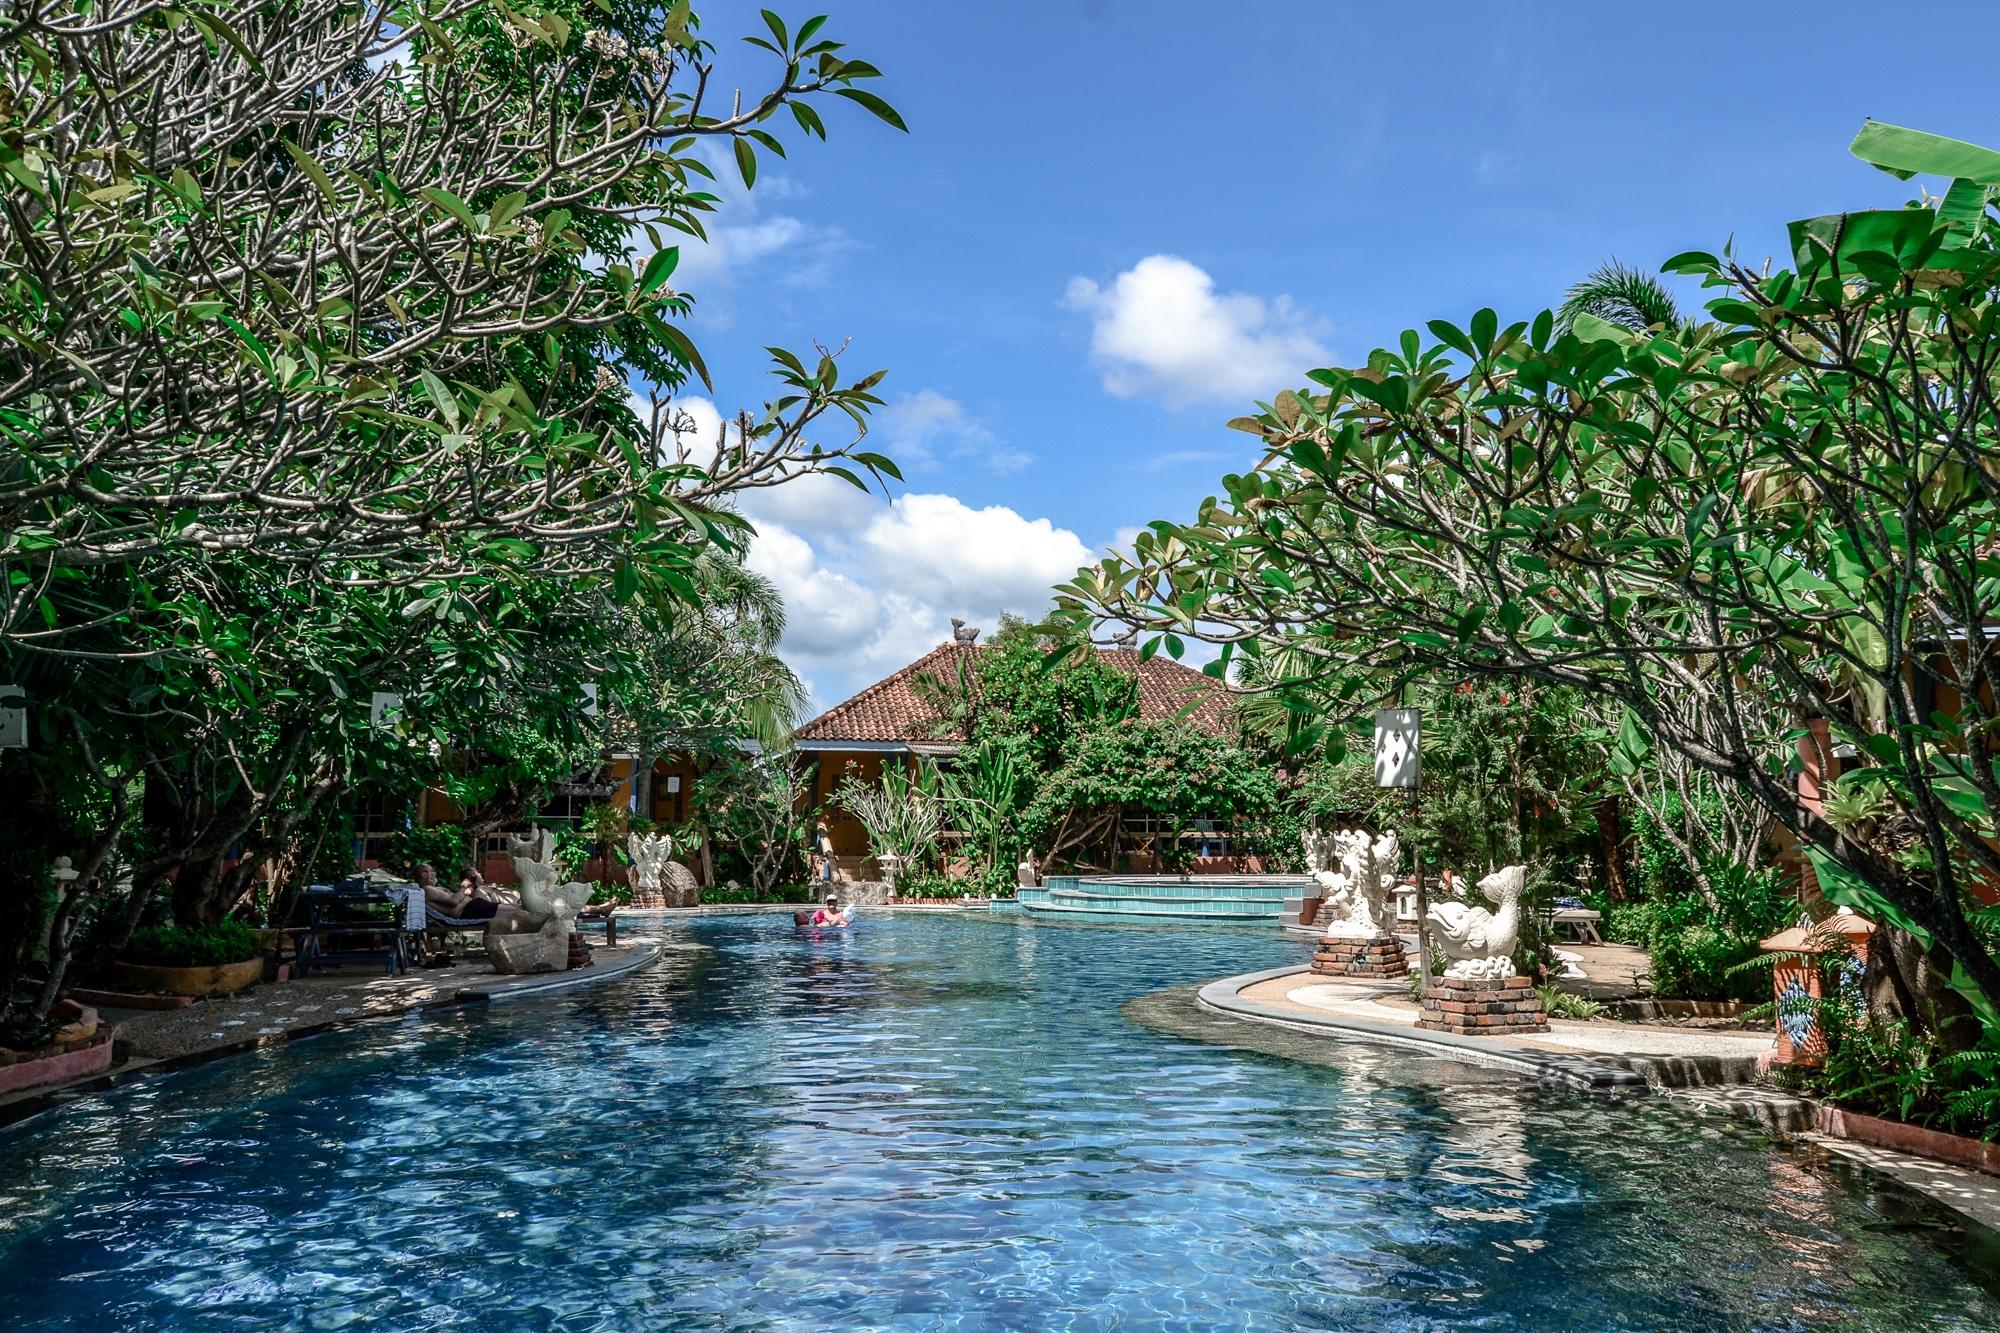 Hotel Review Erfahrungsbericht Aochalong Villa und Spa